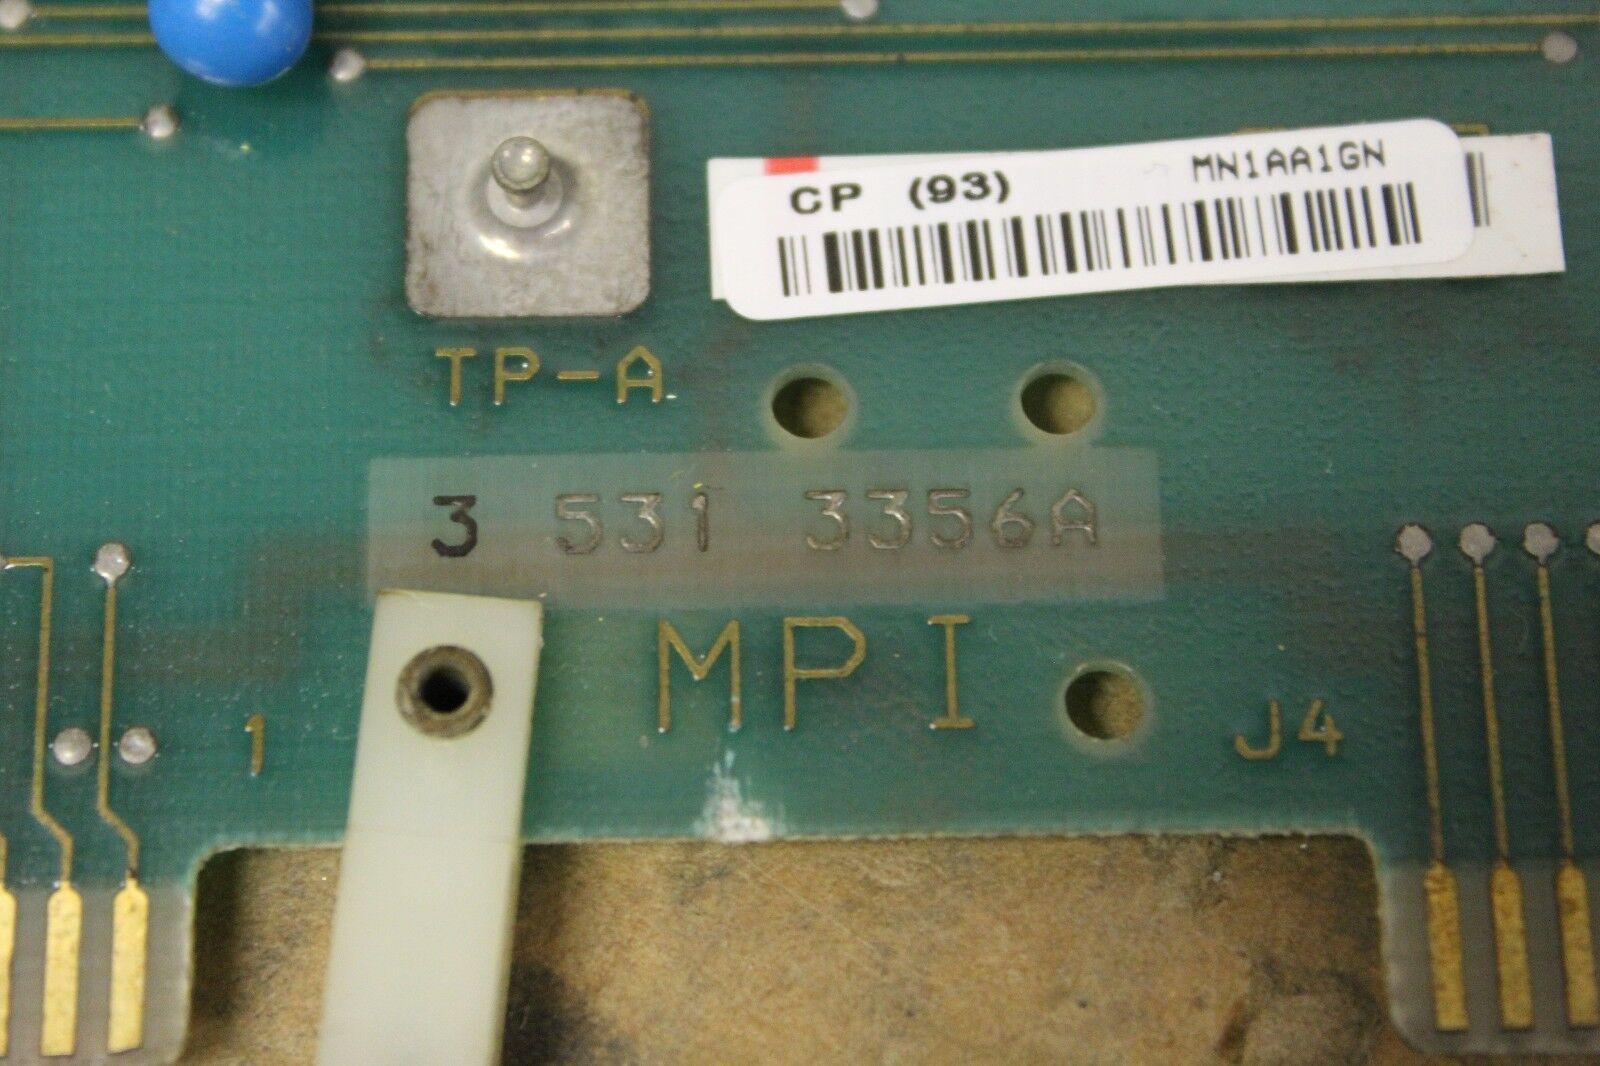 CINCINNATI MILACRON CNC MPI CIRCUIT BOARD CARD 3-531-3356A 35313356A